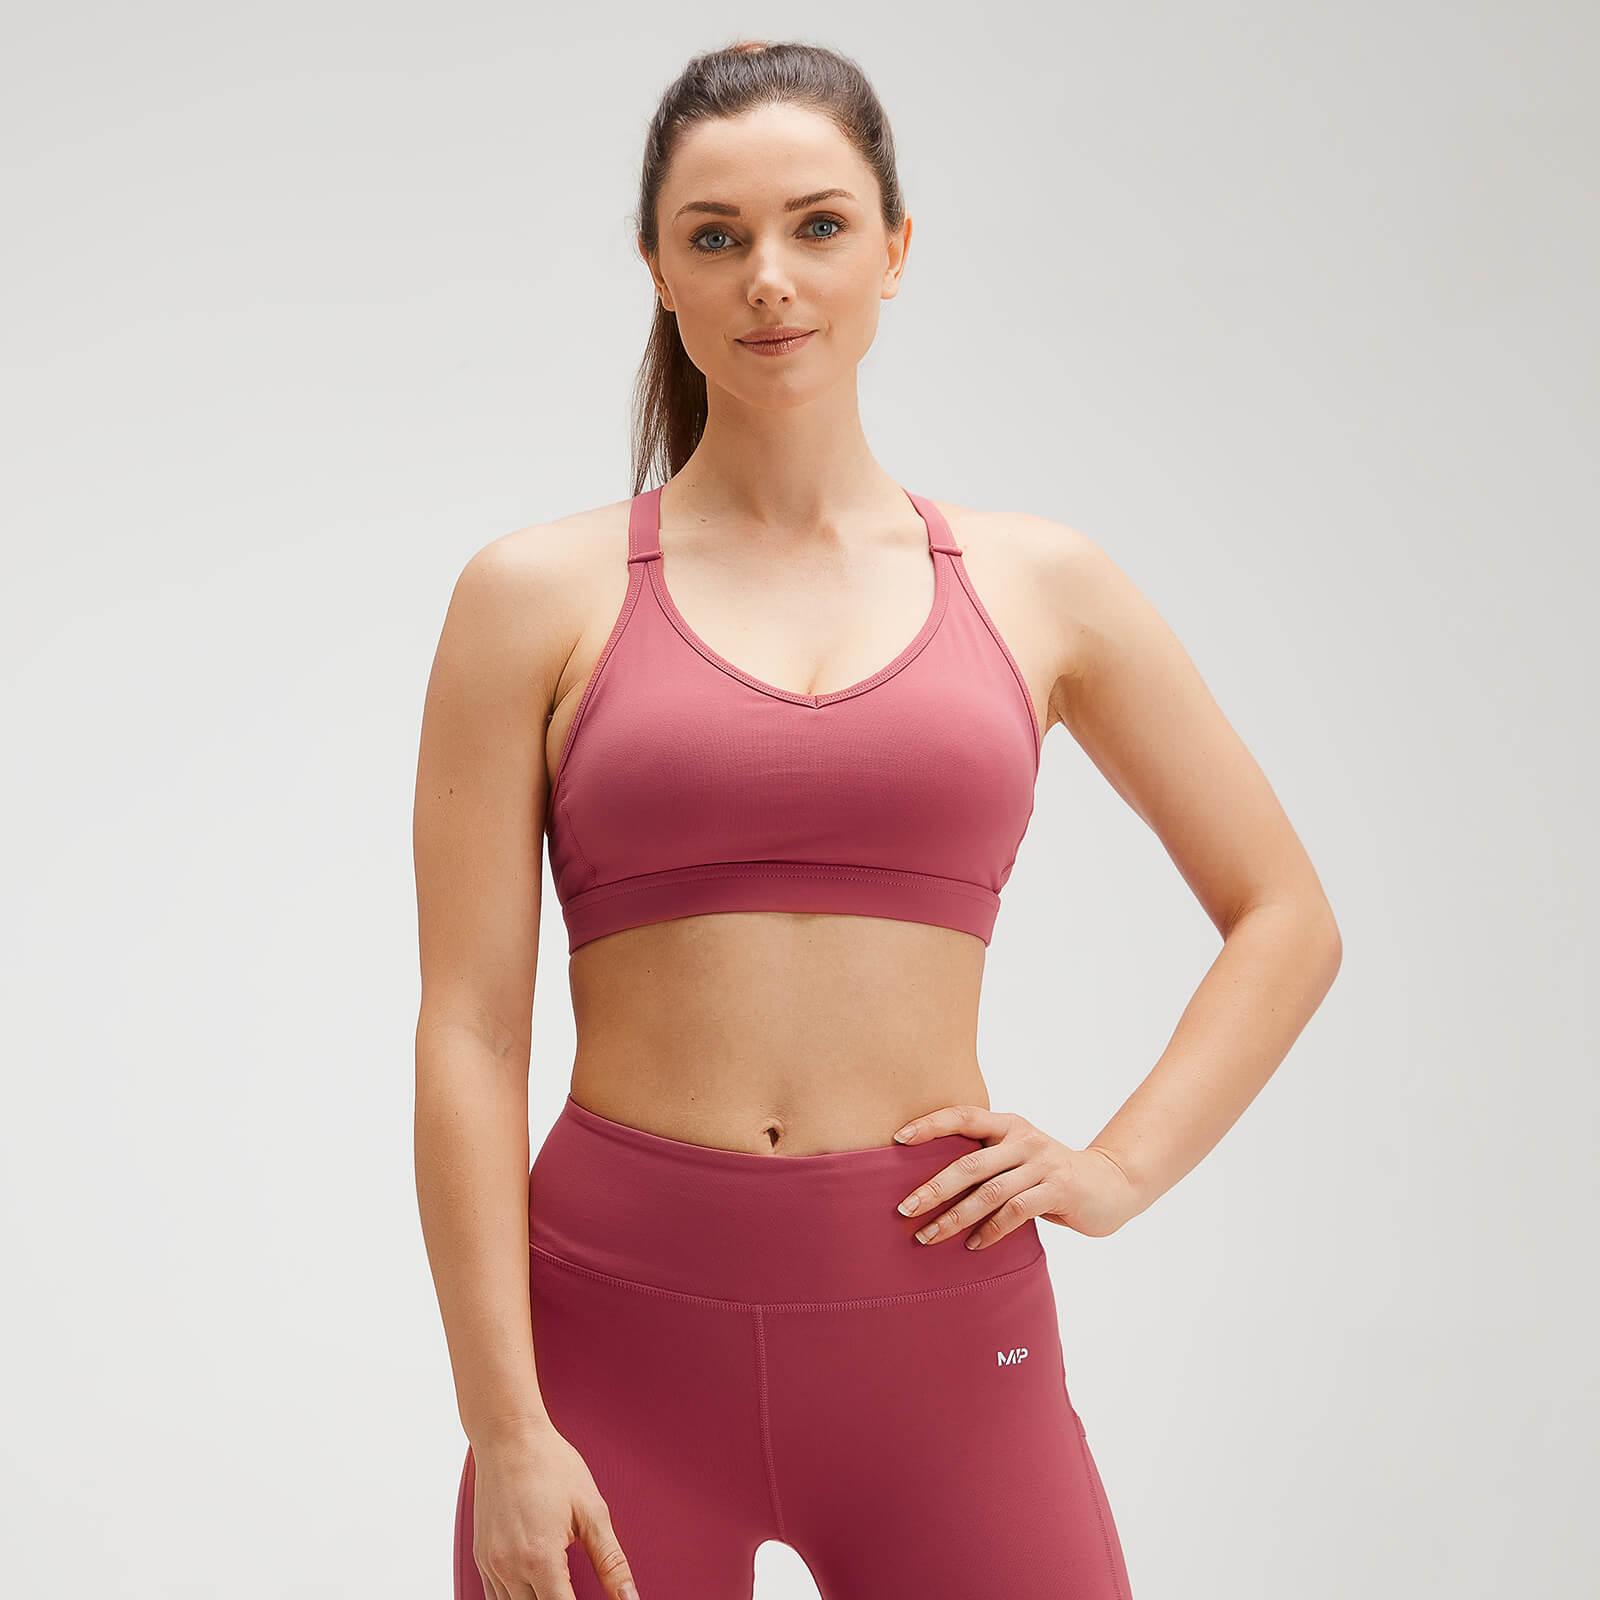 Купить MP Women's Power Mesh Sports Bra - Berry Pink - XXS, Myprotein International